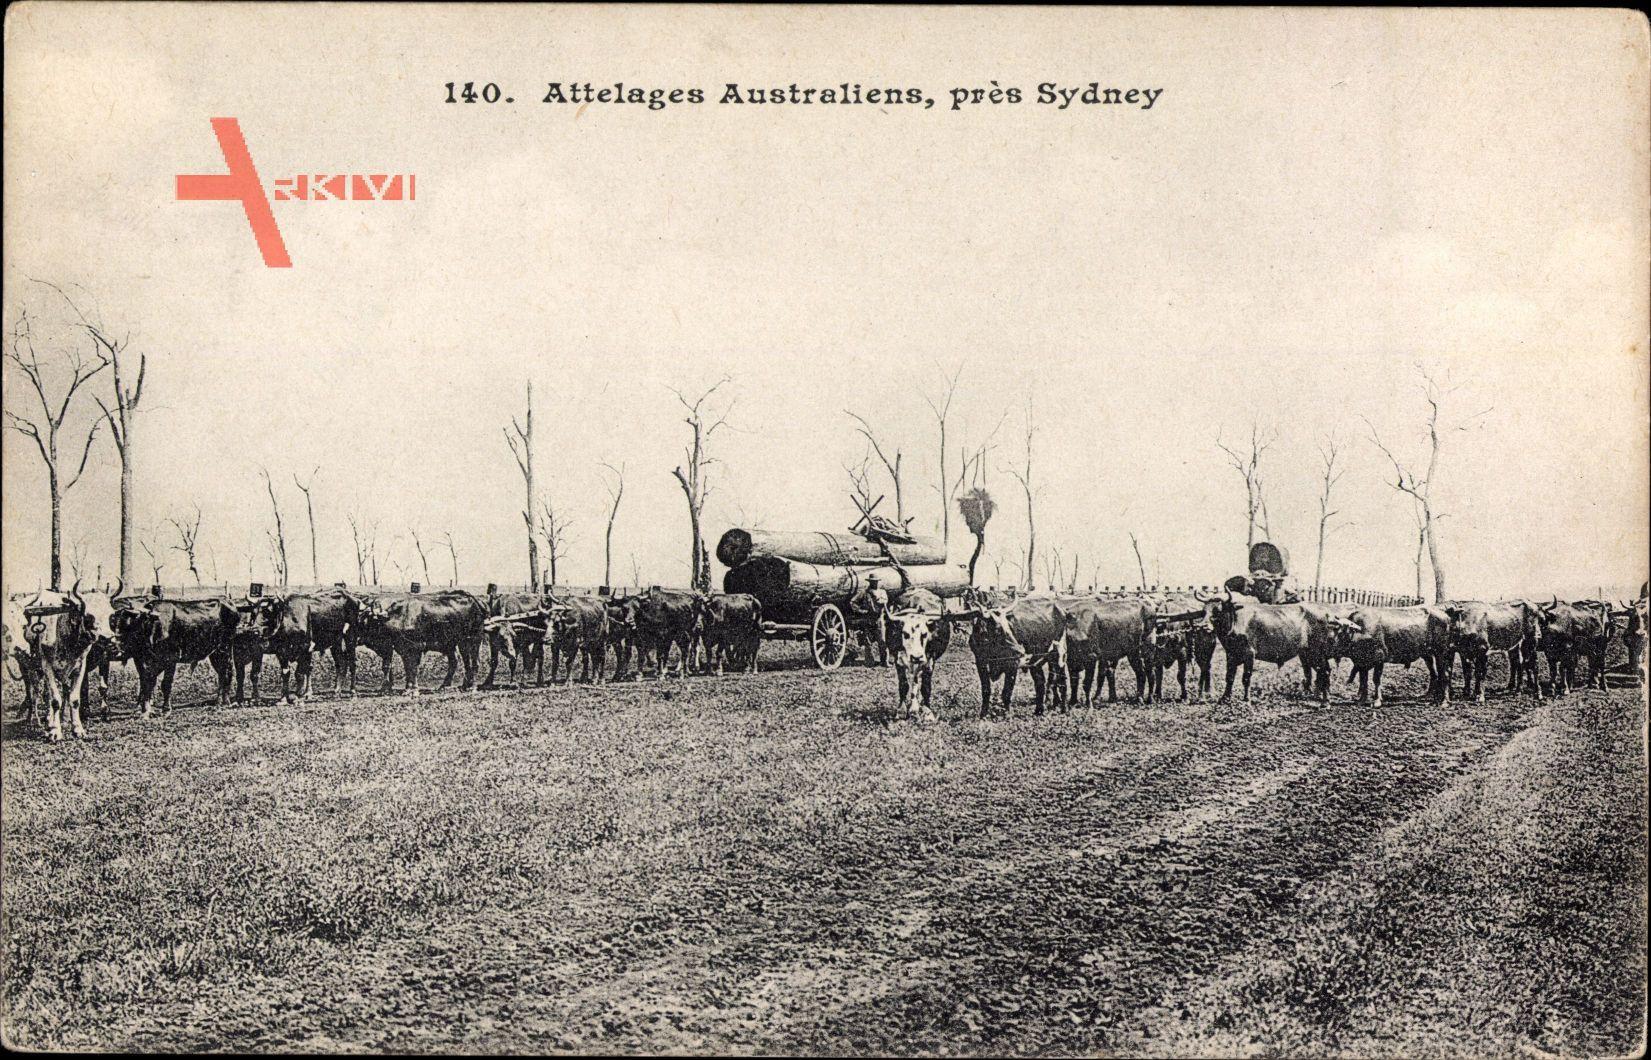 Sydney Australien, Attelages Australiens, Baumstammtransport, Kühe